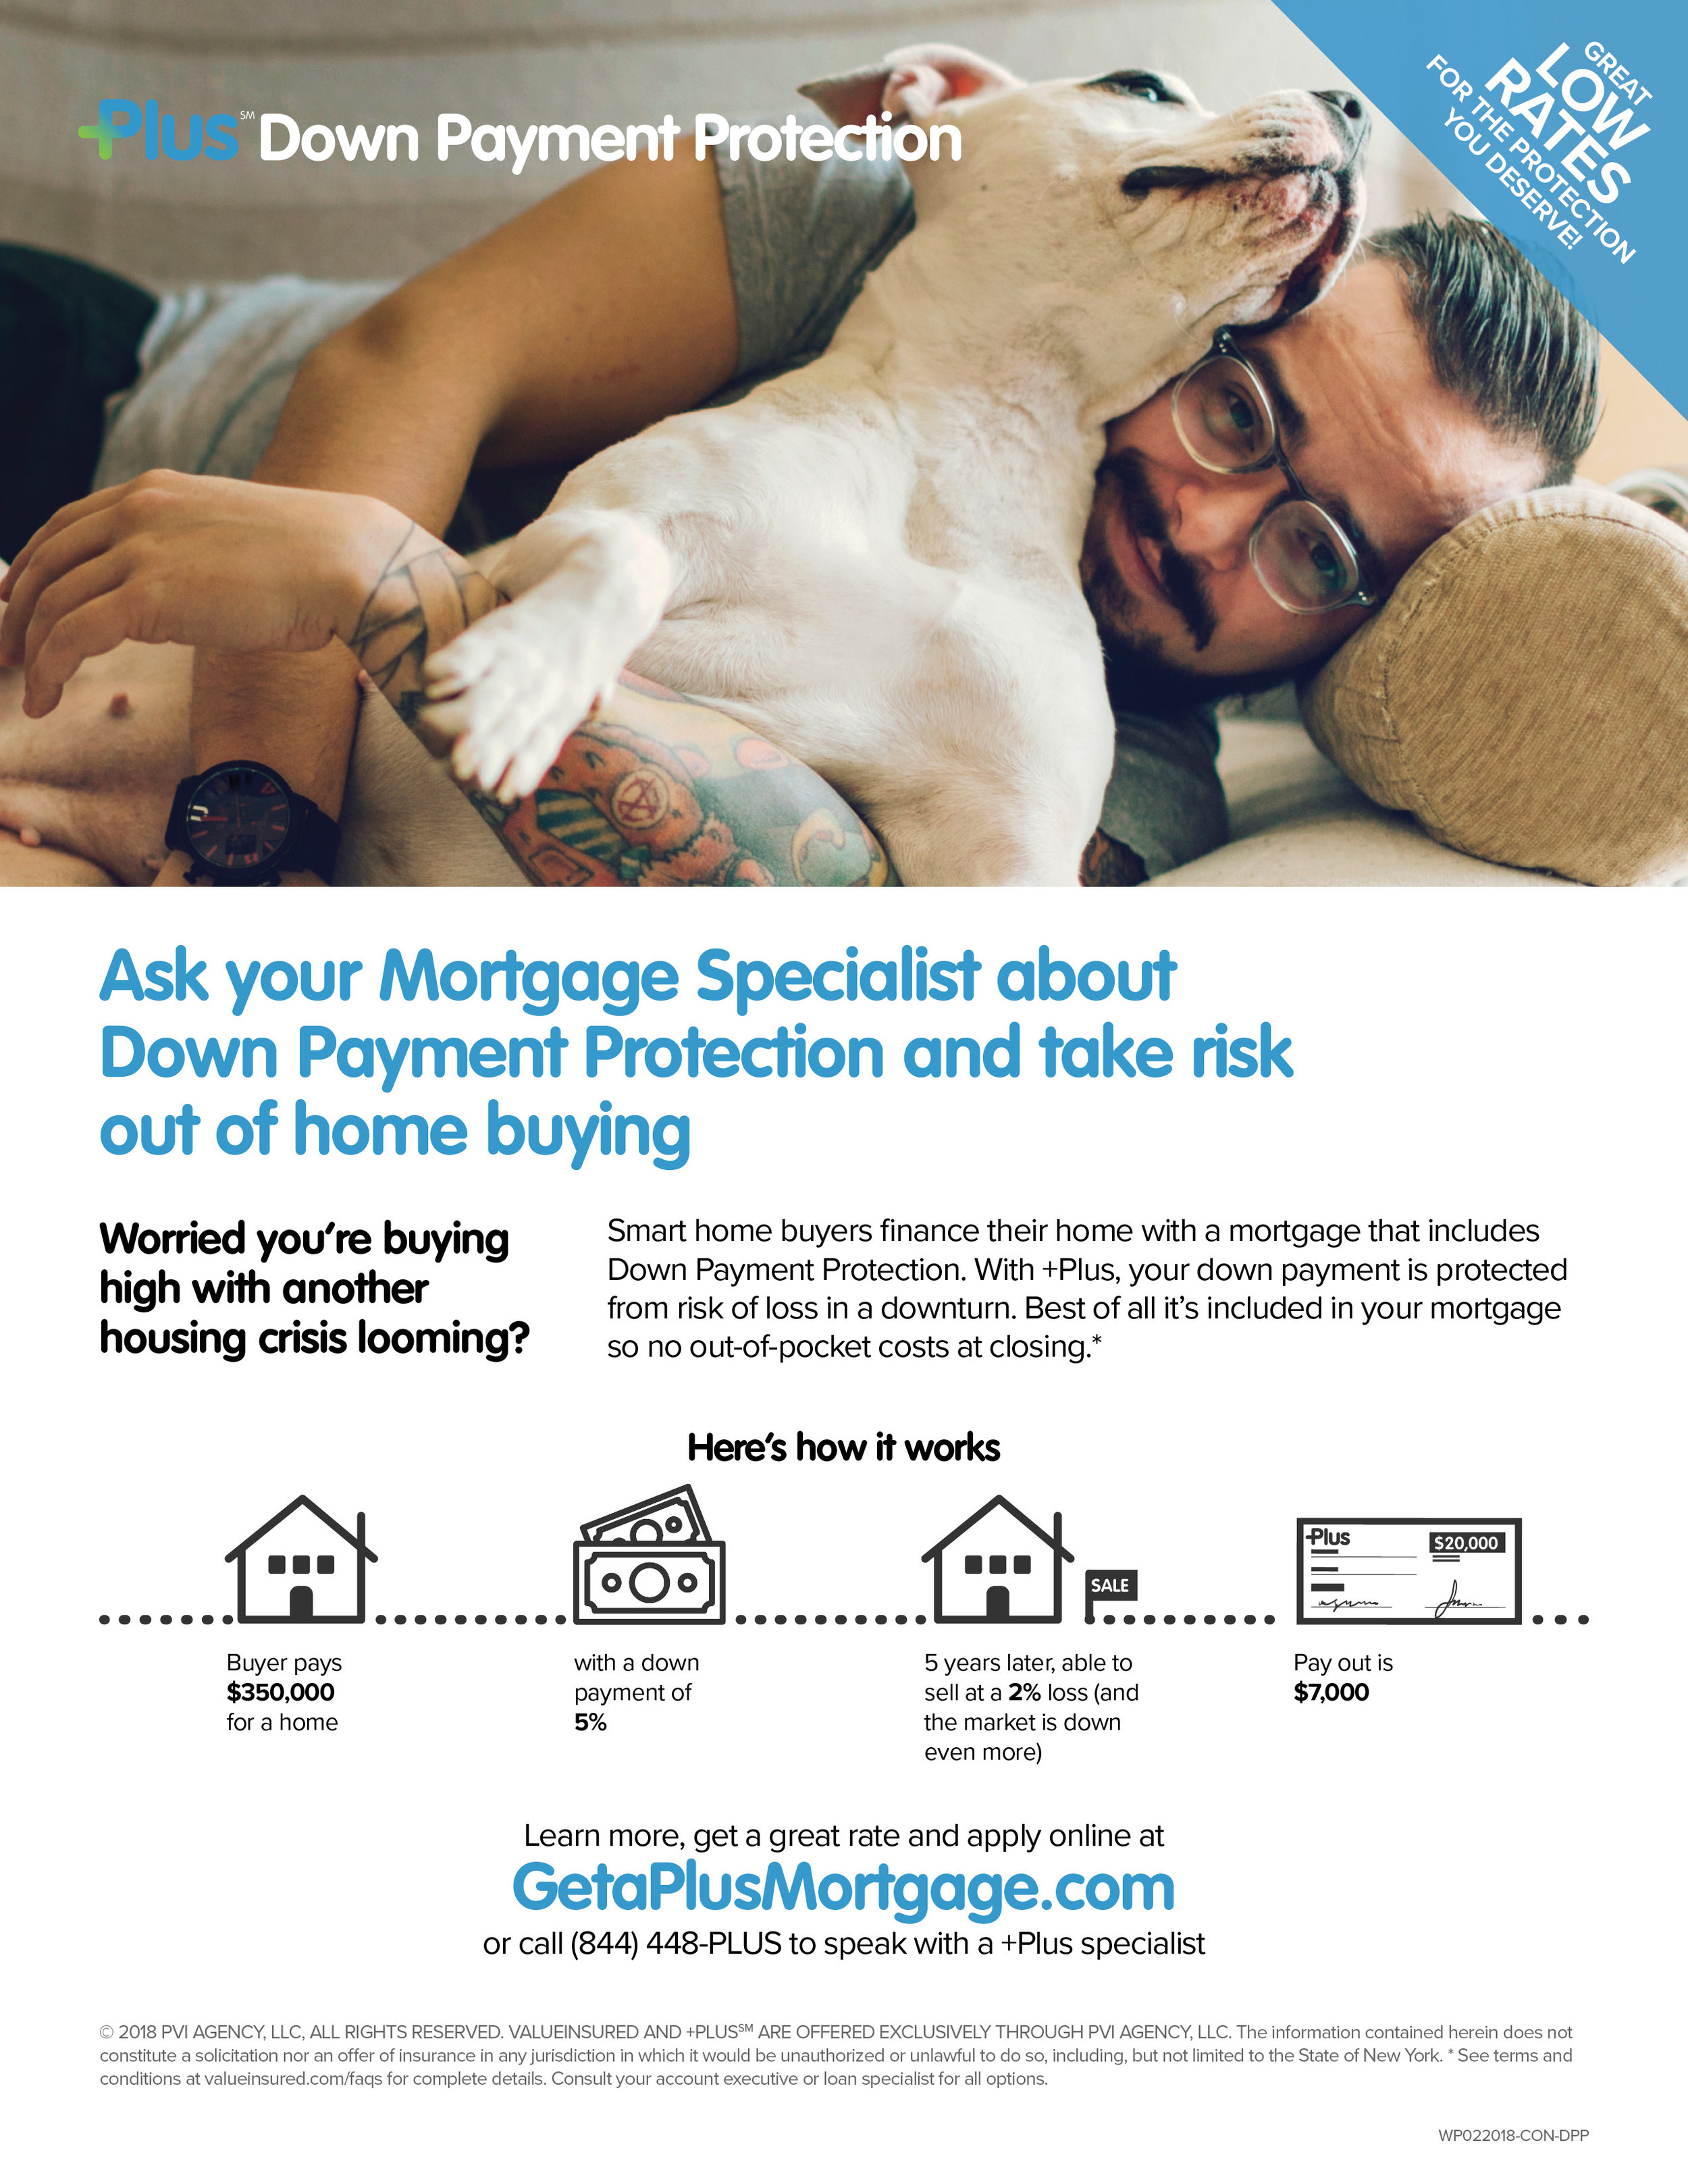 DPP for Borrowers (+Plus Branded)